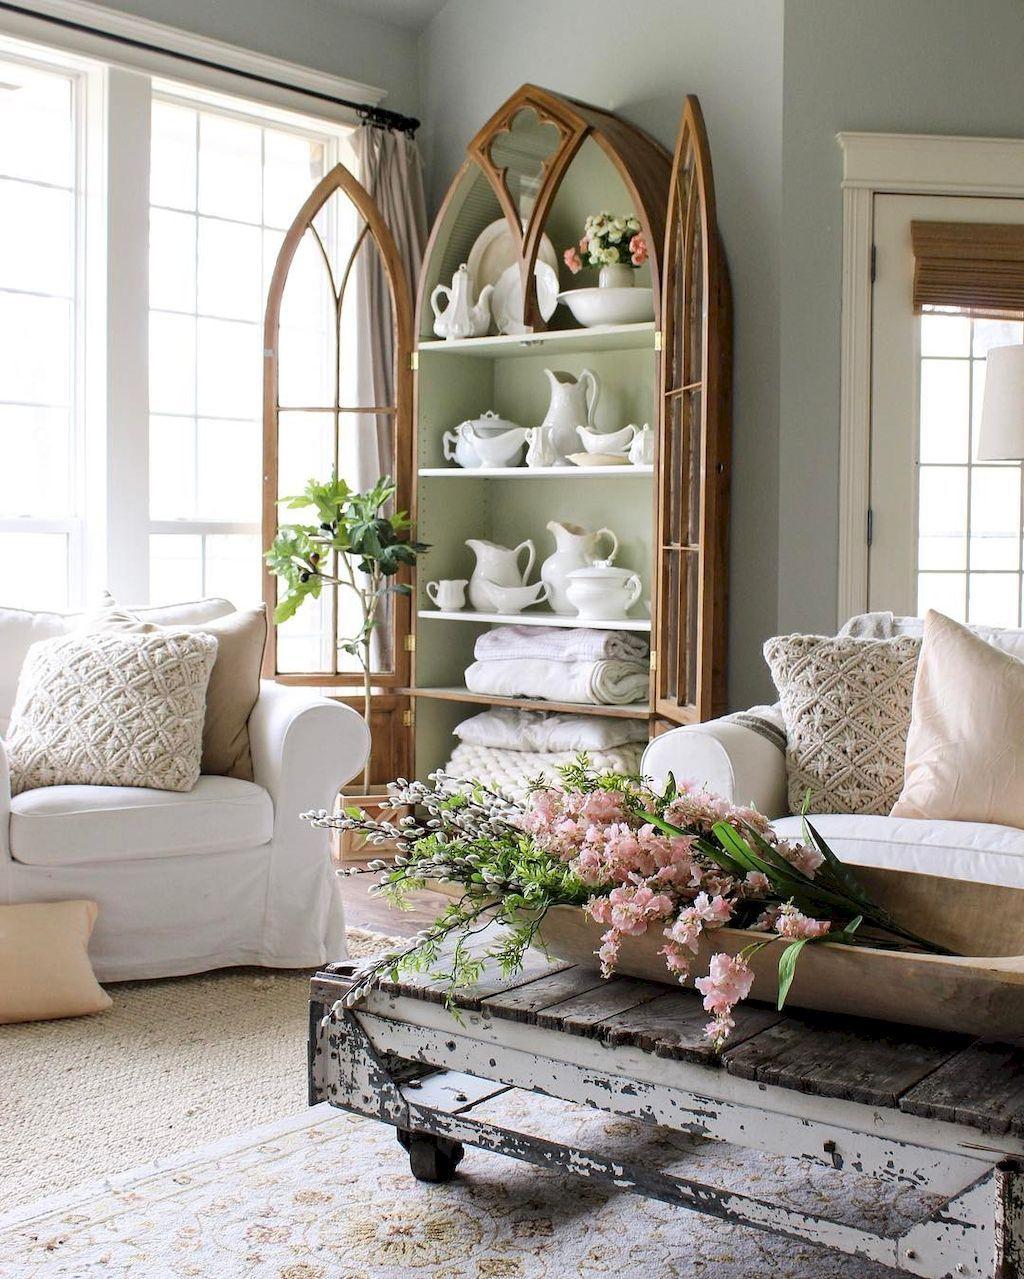 vintage living room decor adorable 60+ vintage living room ideas decoration https://roomadness.com/ HOHFSJL